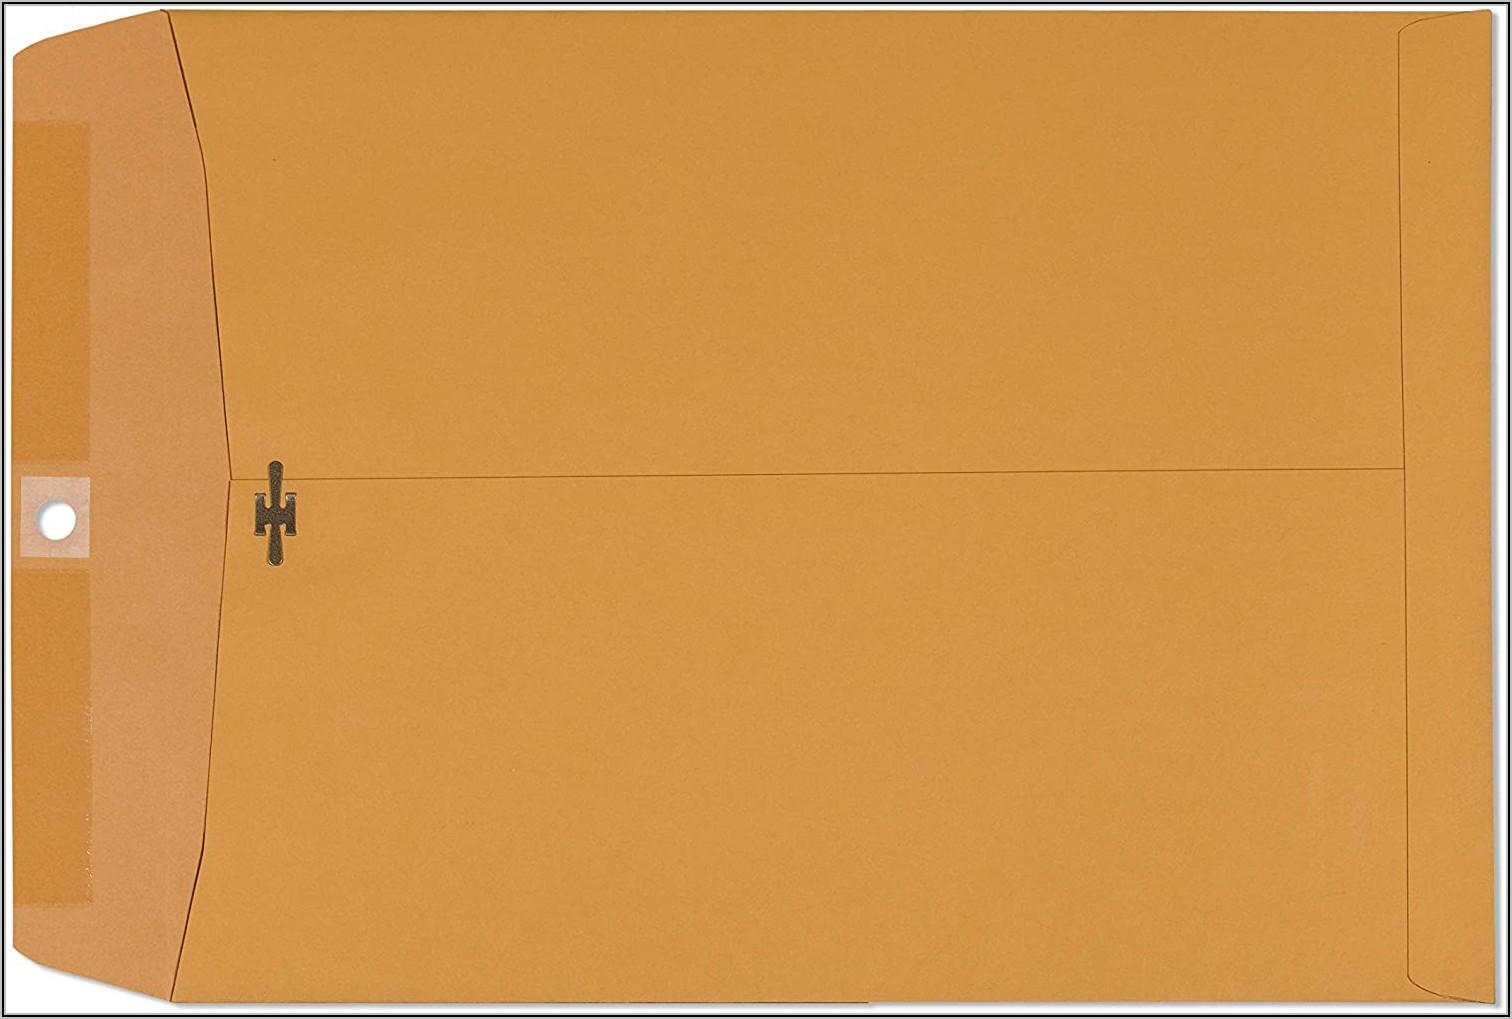 9x12 Kraft Clasp Envelopes